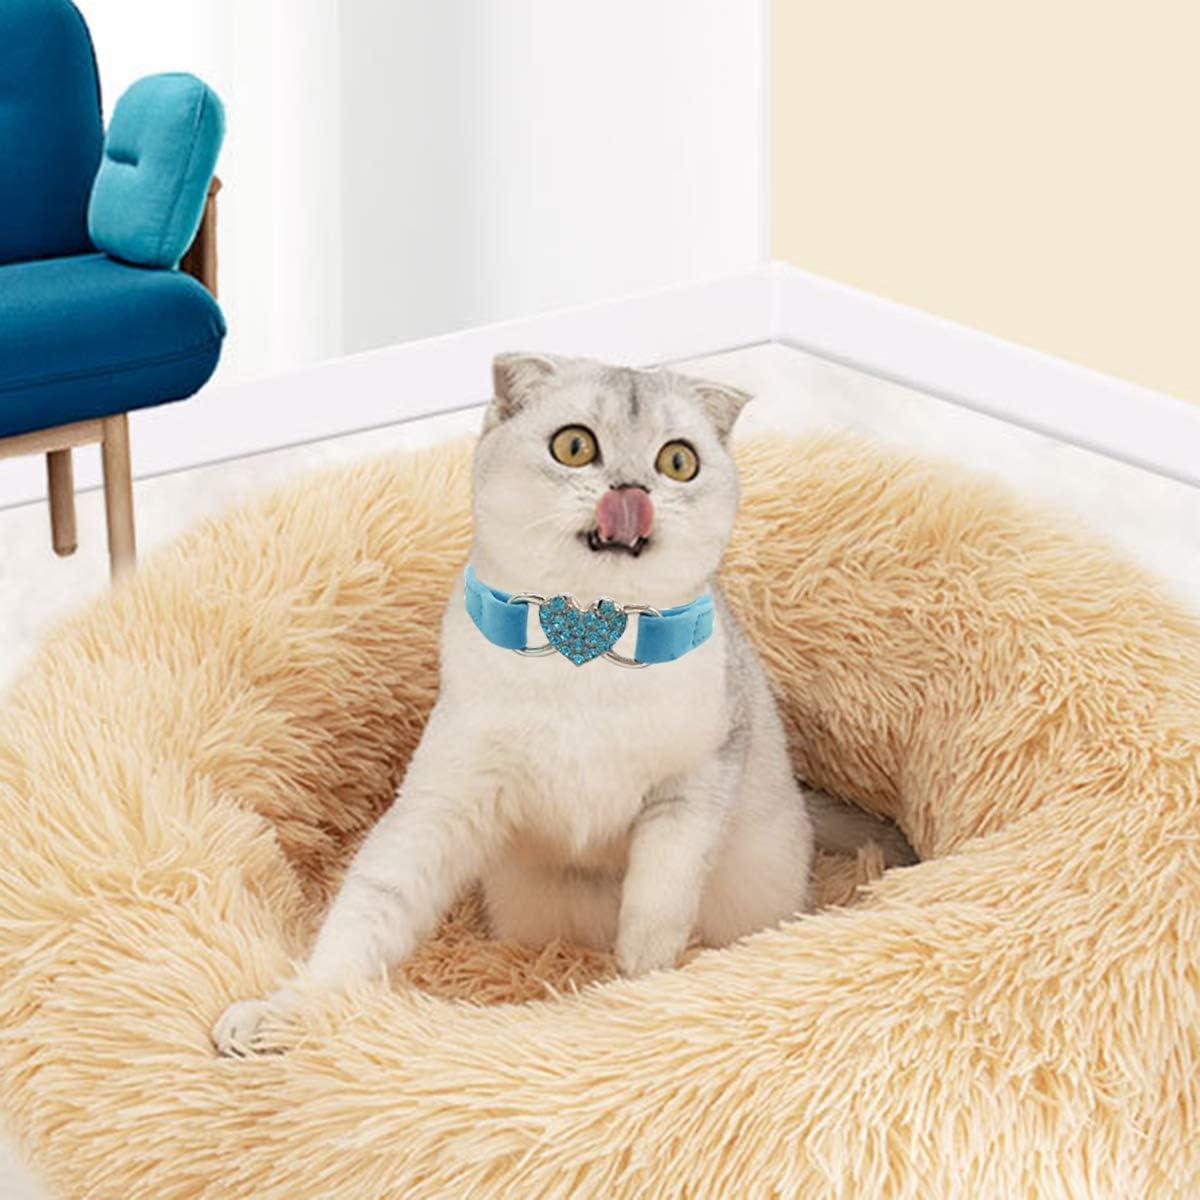 Pet Supplies Tabpole Cat Collar Heart Bling Adjustable Collar for ...